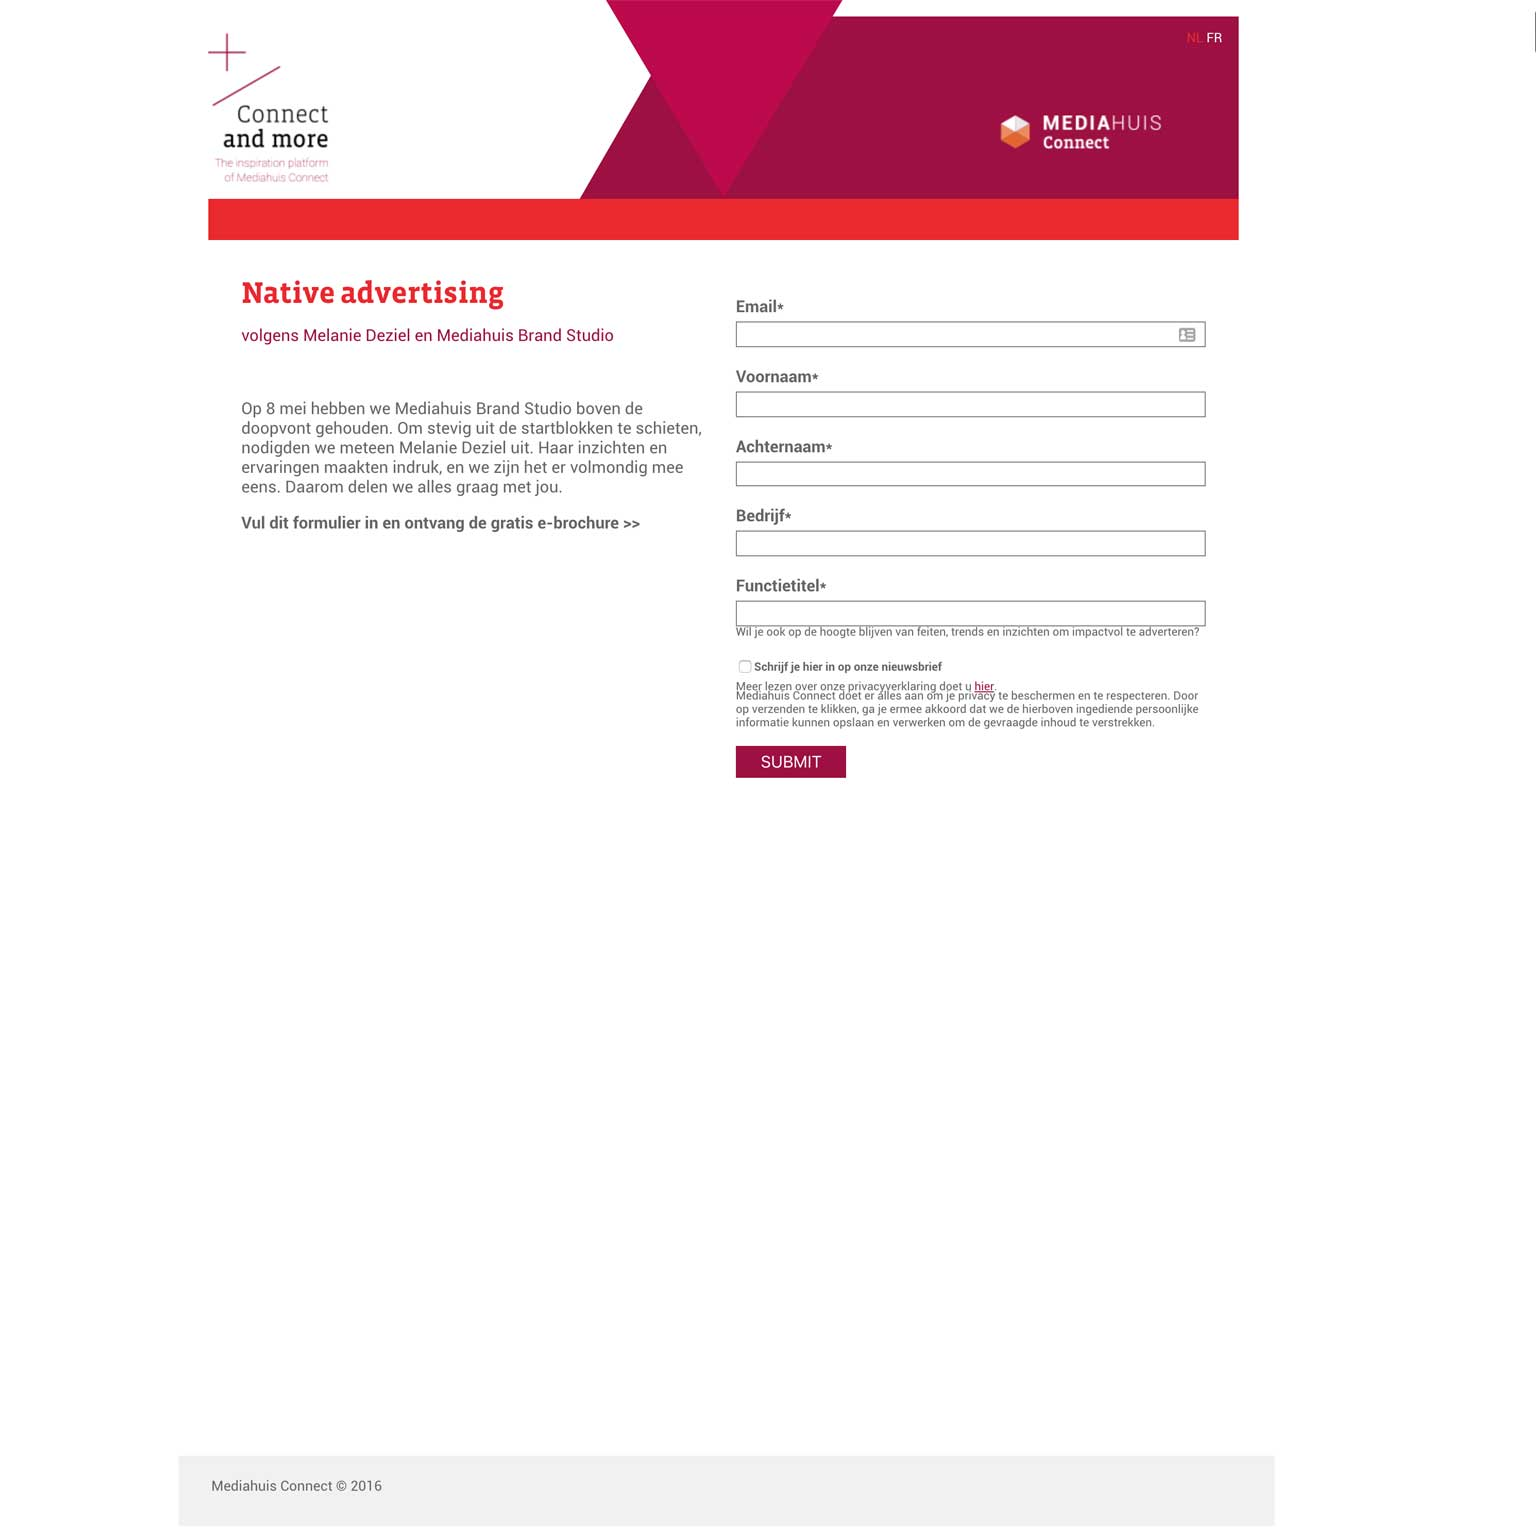 1536x1536-case-study-mediahuis-landing-page